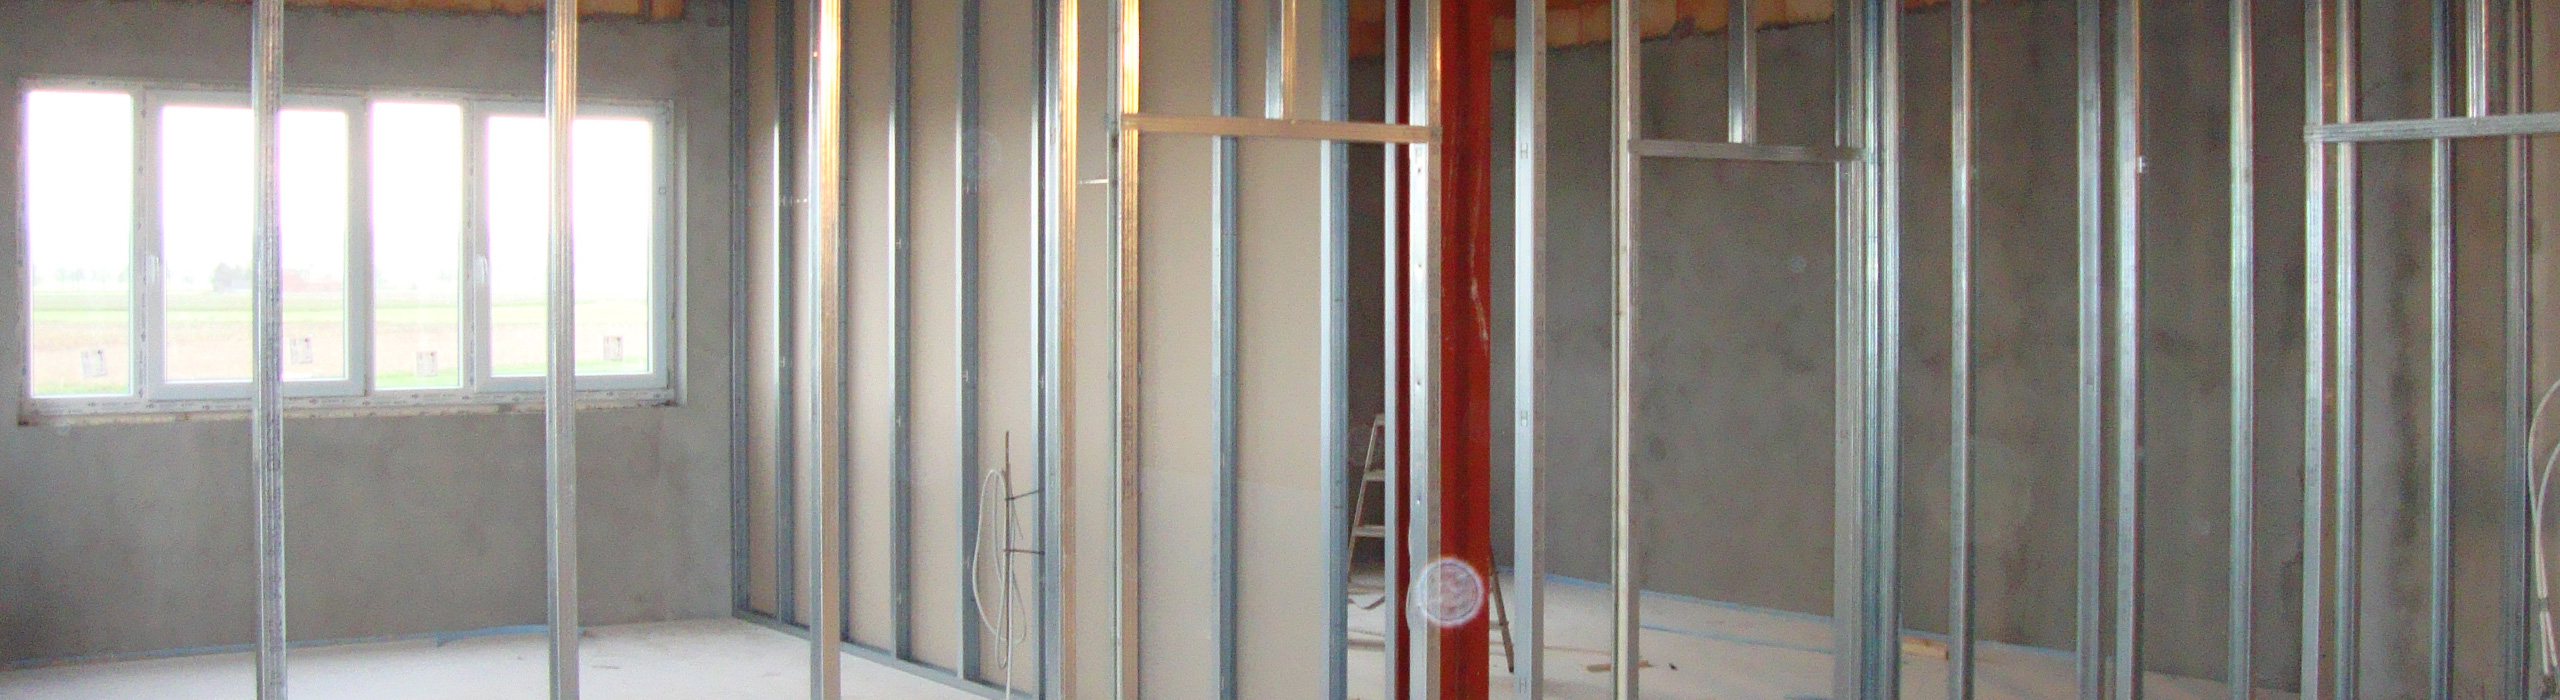 trockenbau sprechen with trockenbau cool schritt fr schritt zur neuen wand with trockenbau. Black Bedroom Furniture Sets. Home Design Ideas